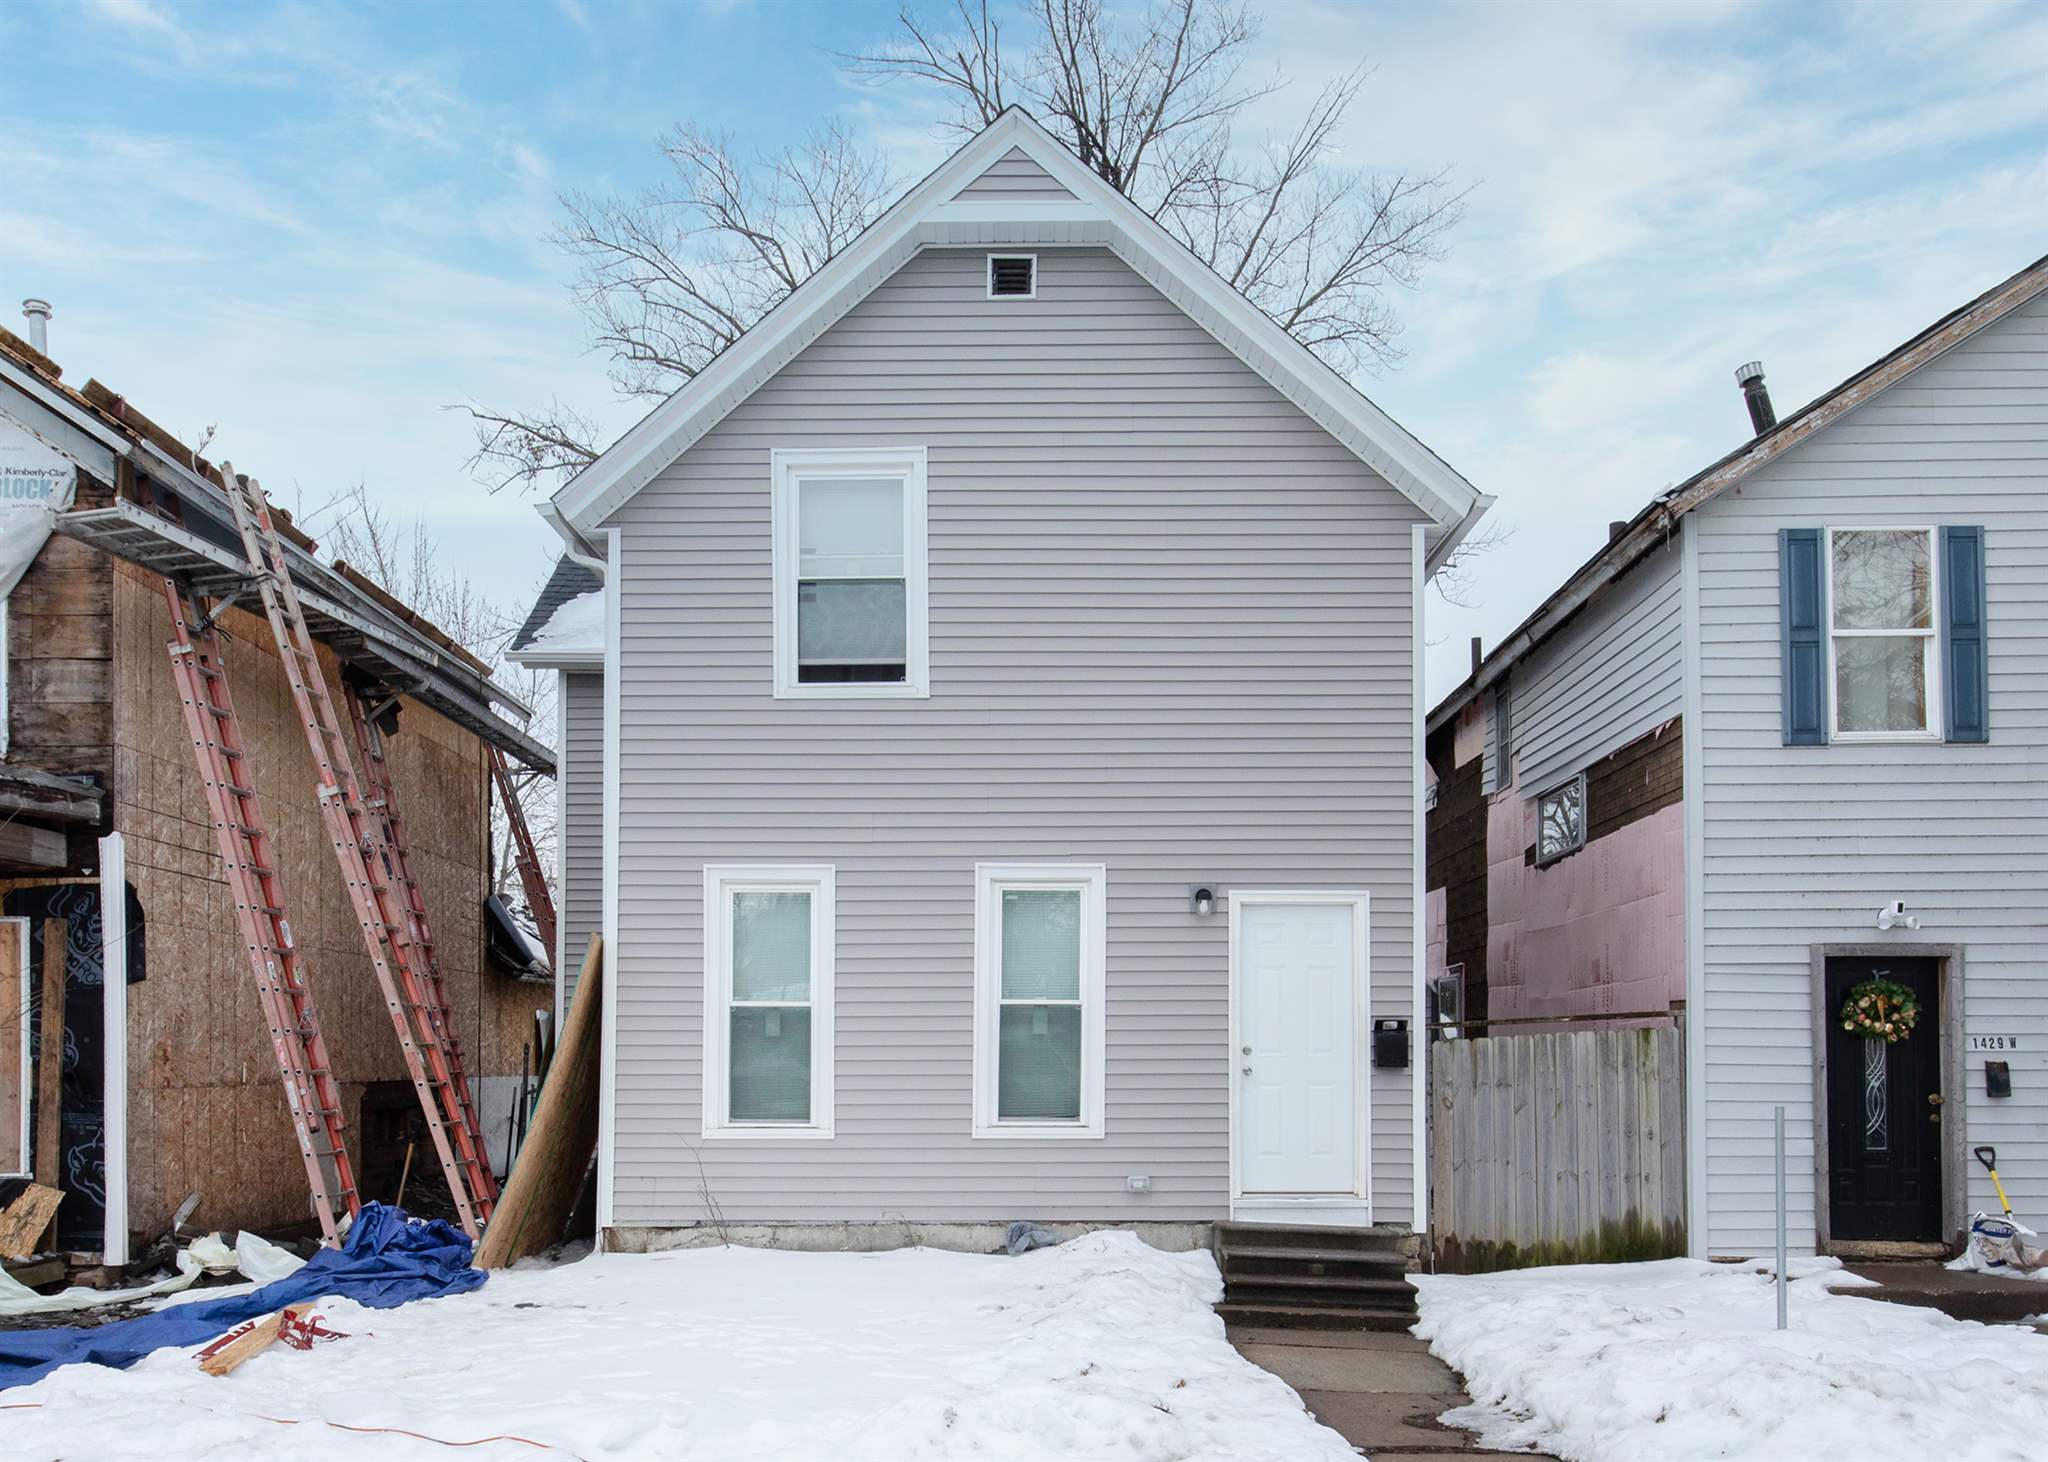 1427 W 4TH Property Photo - Davenport, IA real estate listing